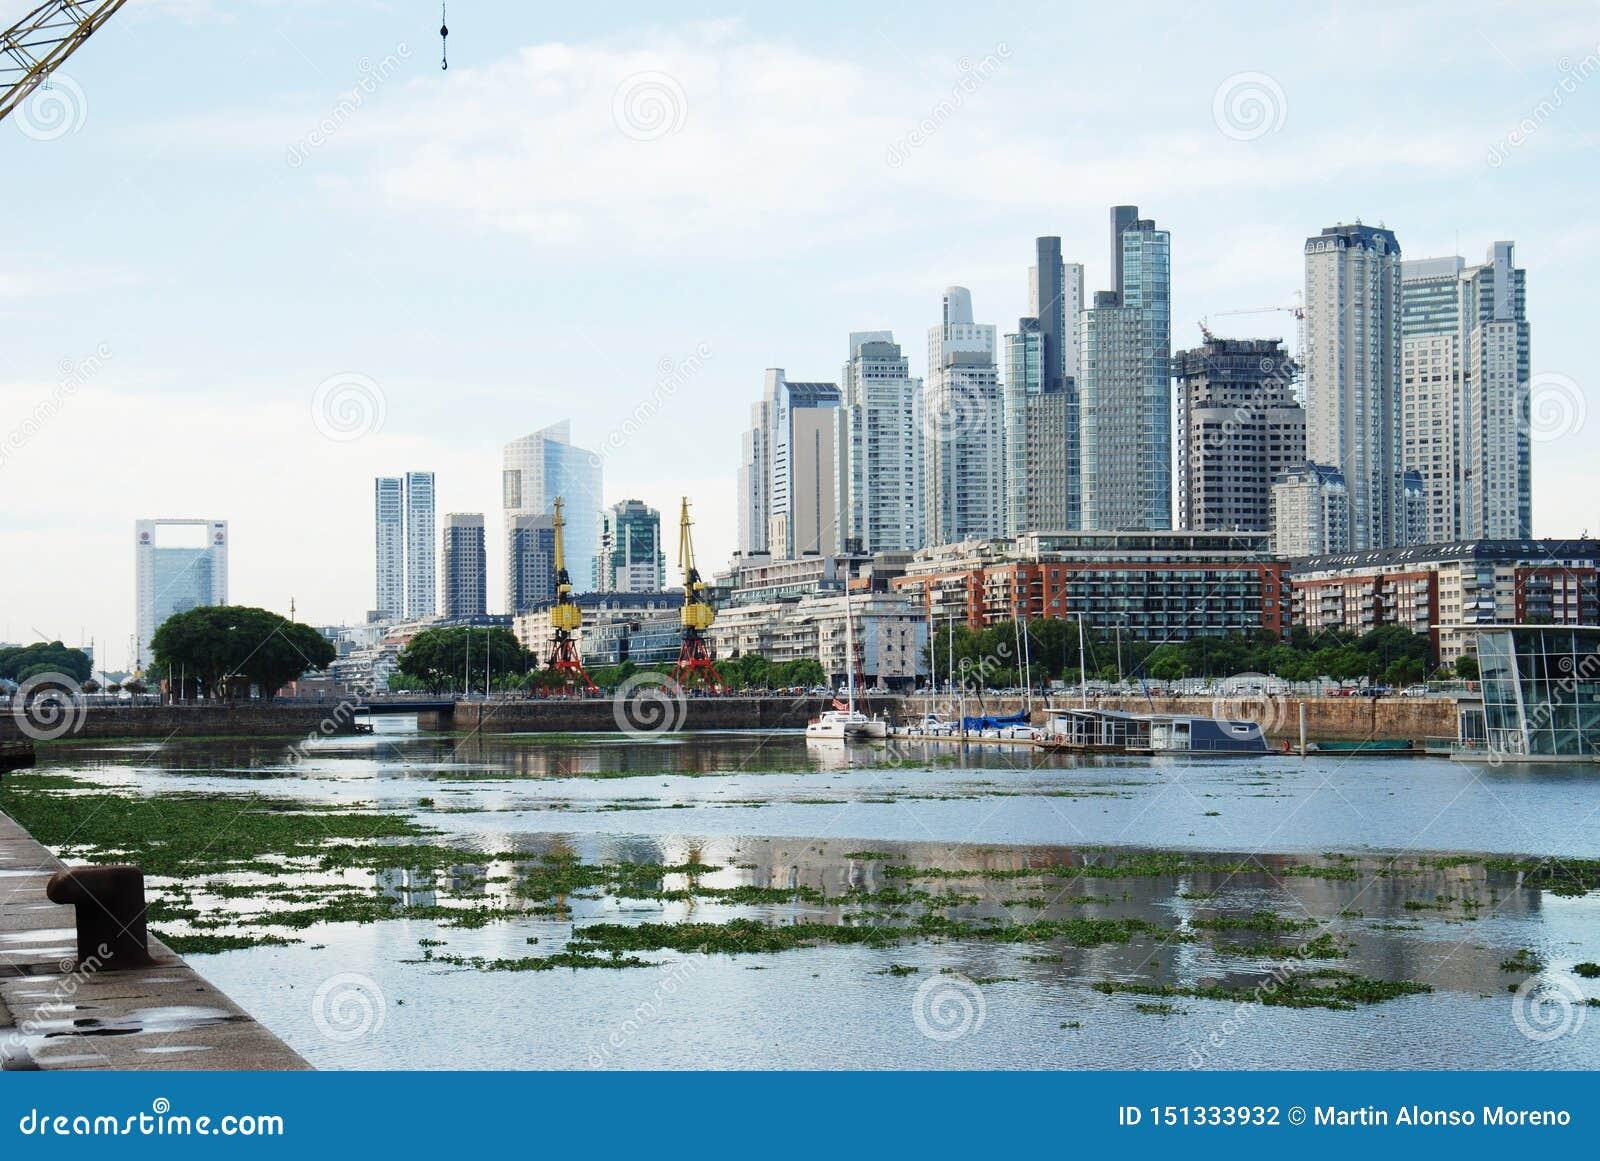 Paisaje urbano de Buenos Aires, capital de la Argentina